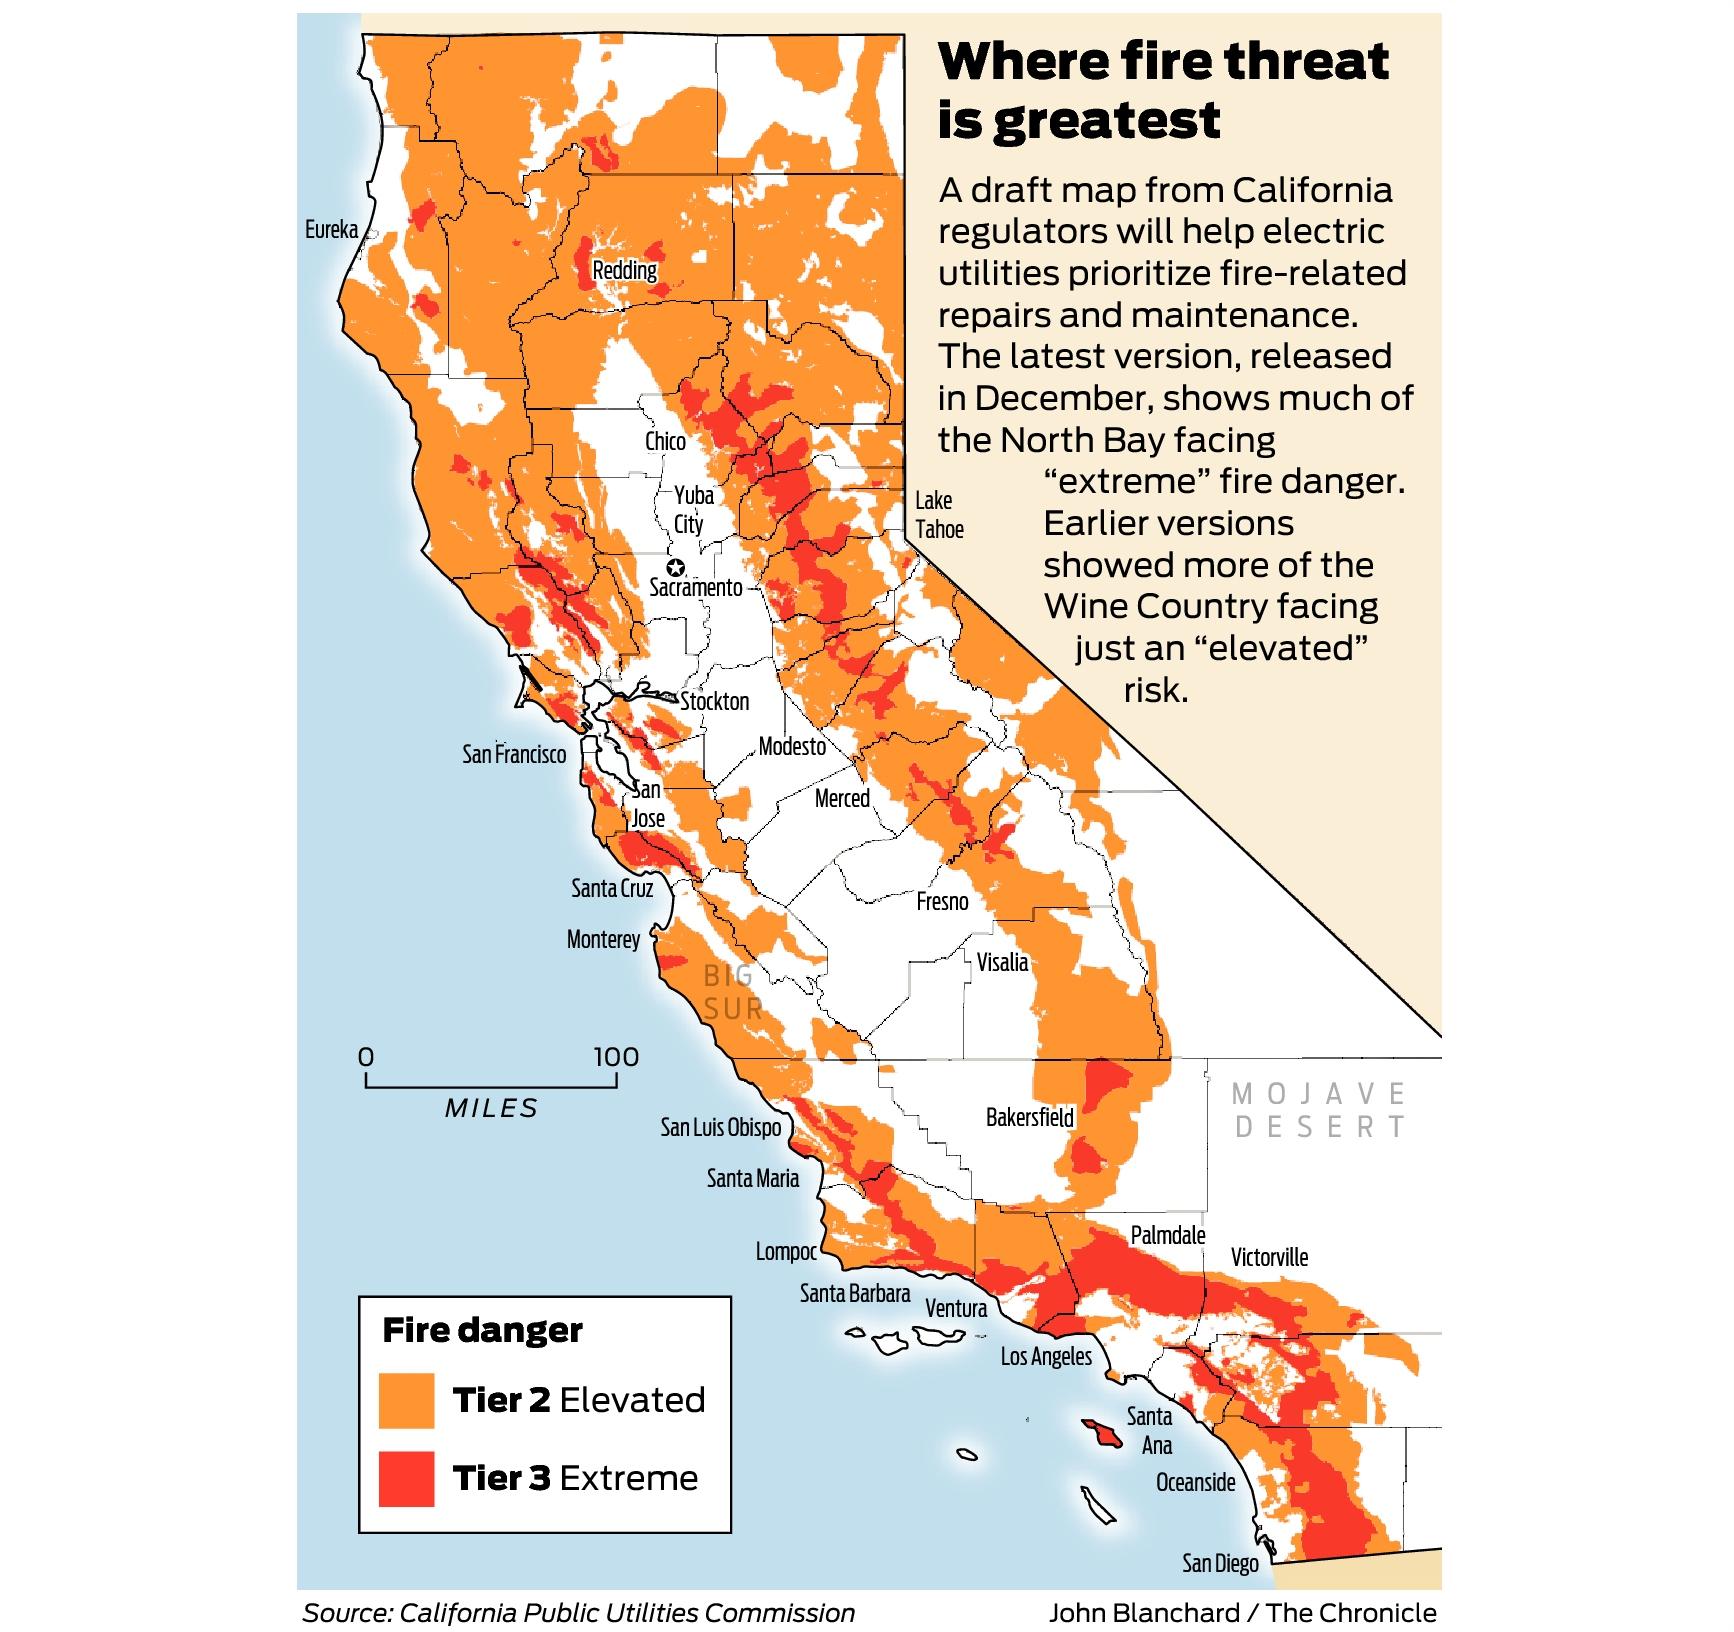 California Fire-Threat Map Not Quite Done But Close, Regulators Say - California Fires Update Map